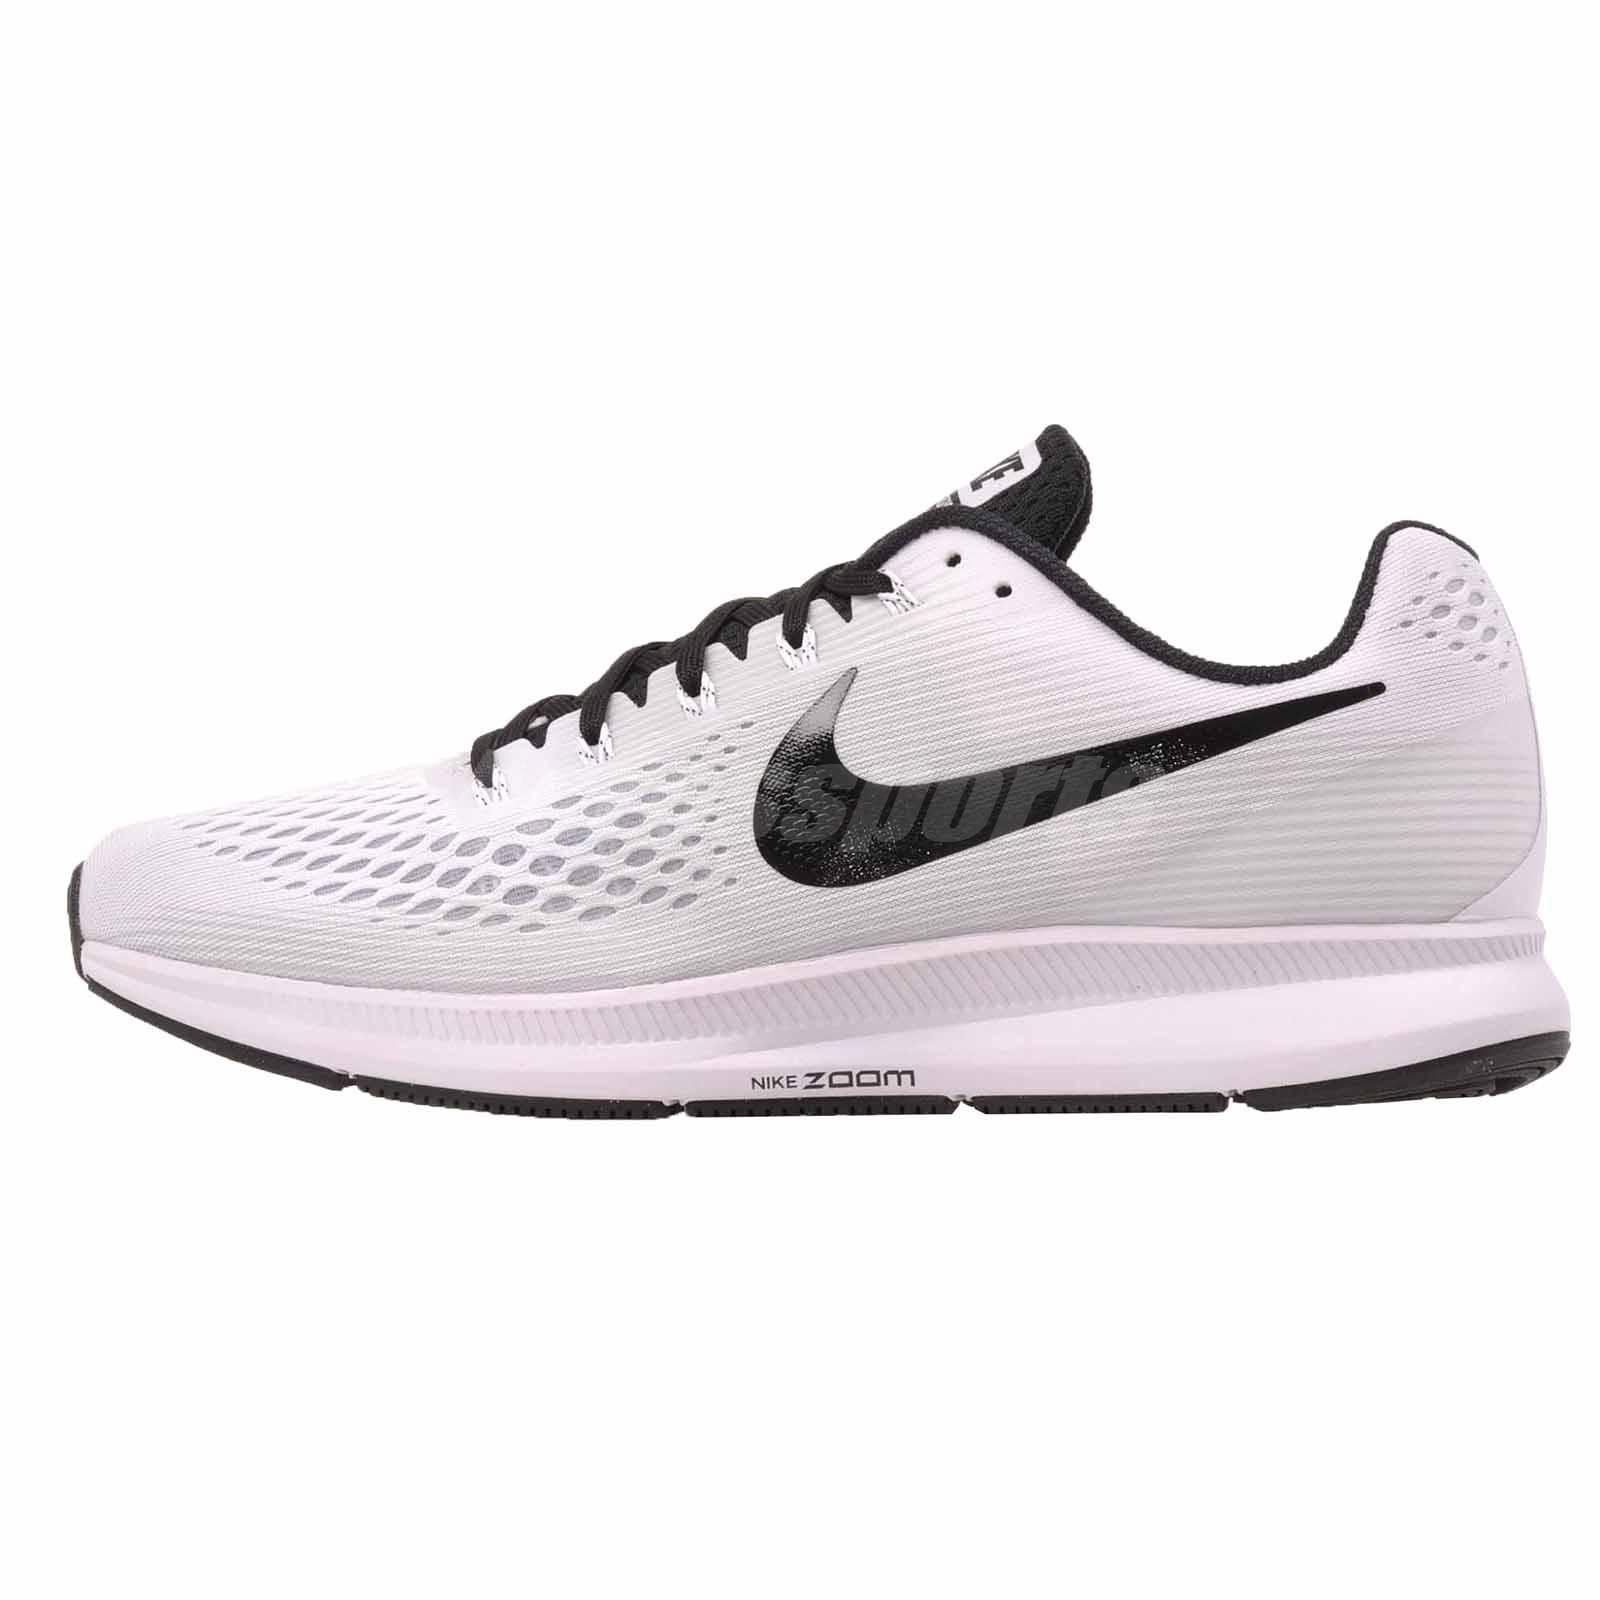 81847d297c62f Nike Air Zoom Pegasus 34 TB Running Mens Shoes White Black 887009 ...